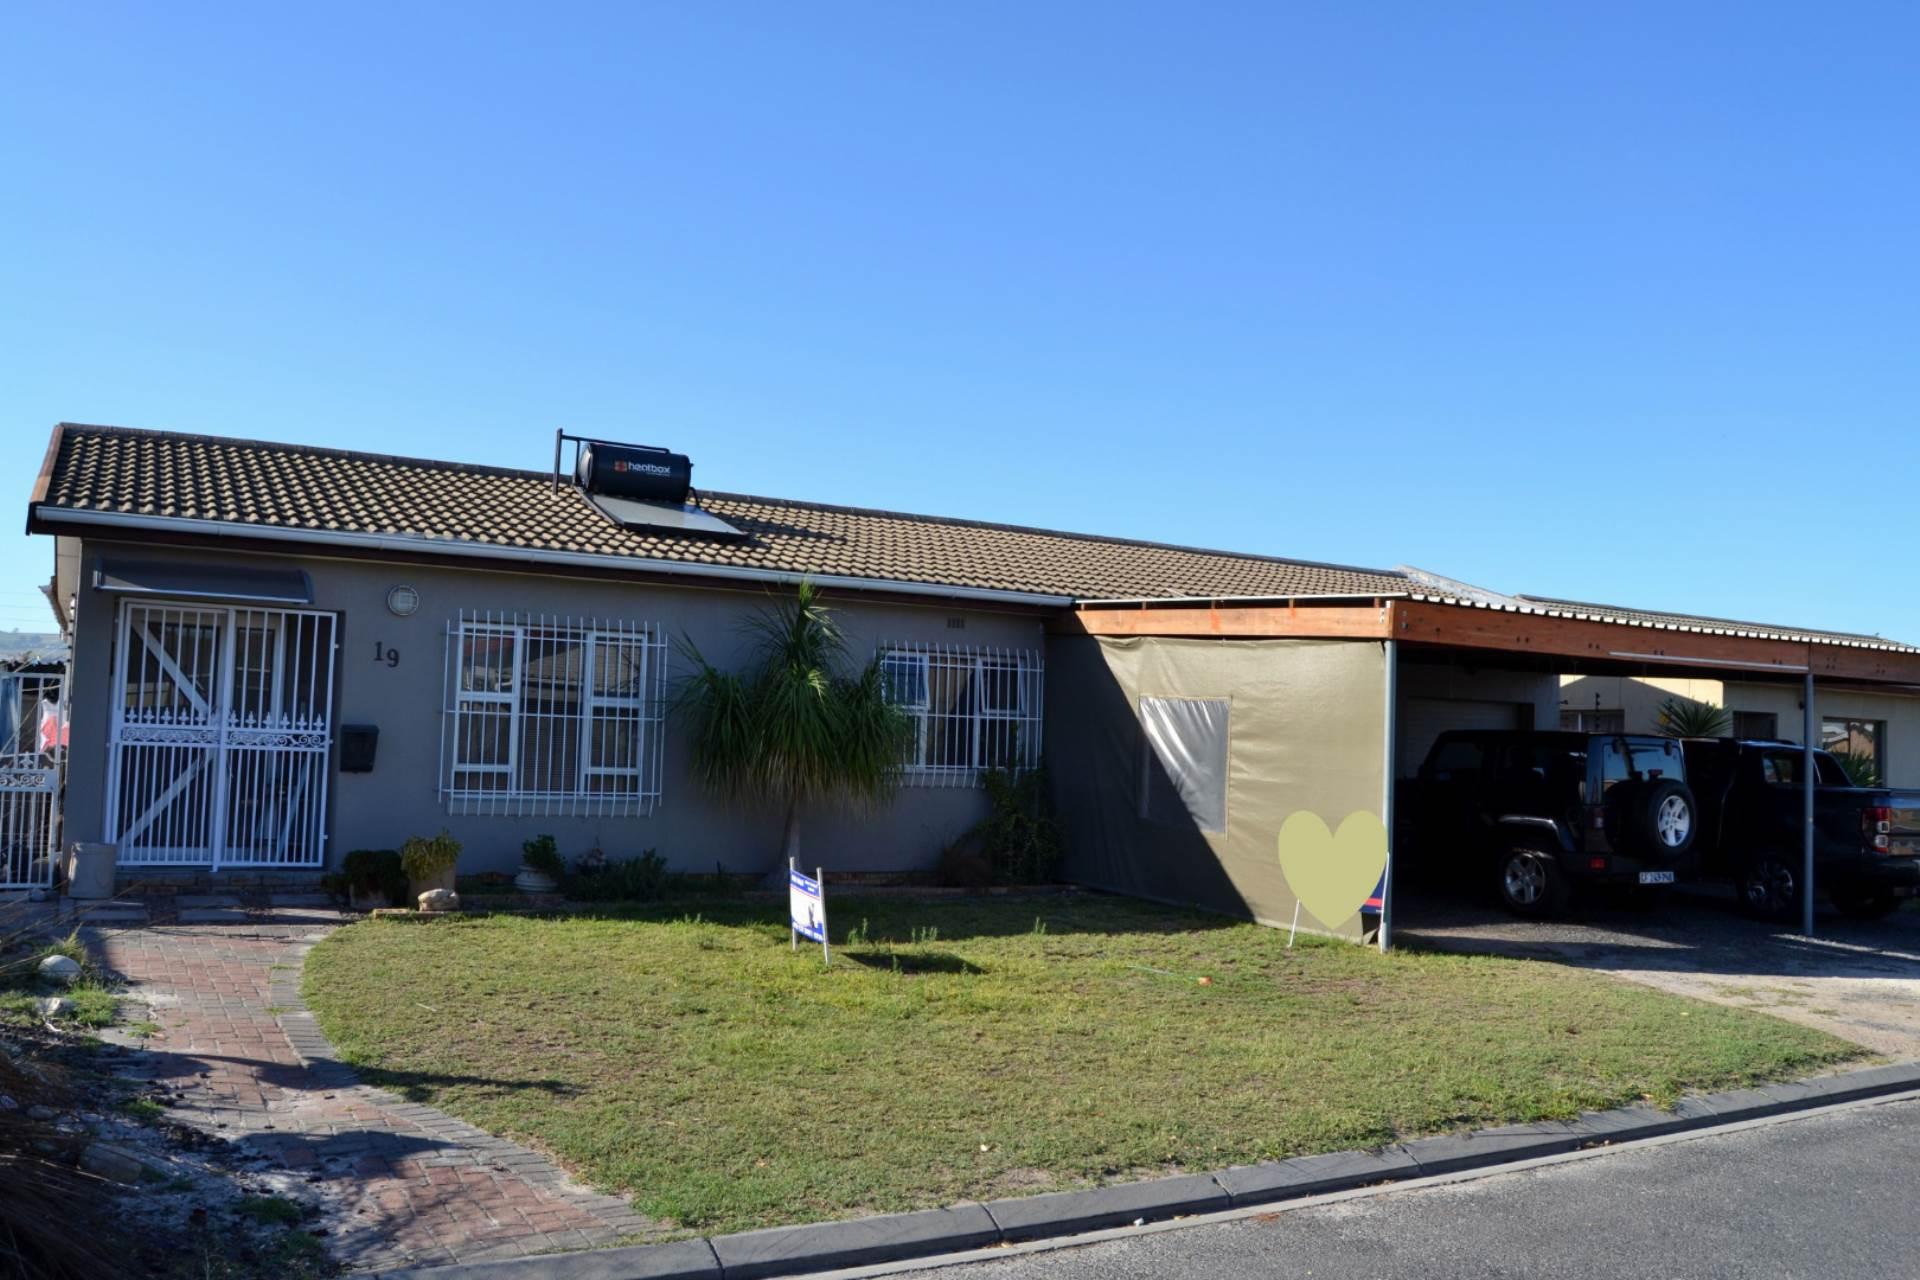 4 BedroomHouse For Sale In St Dumas